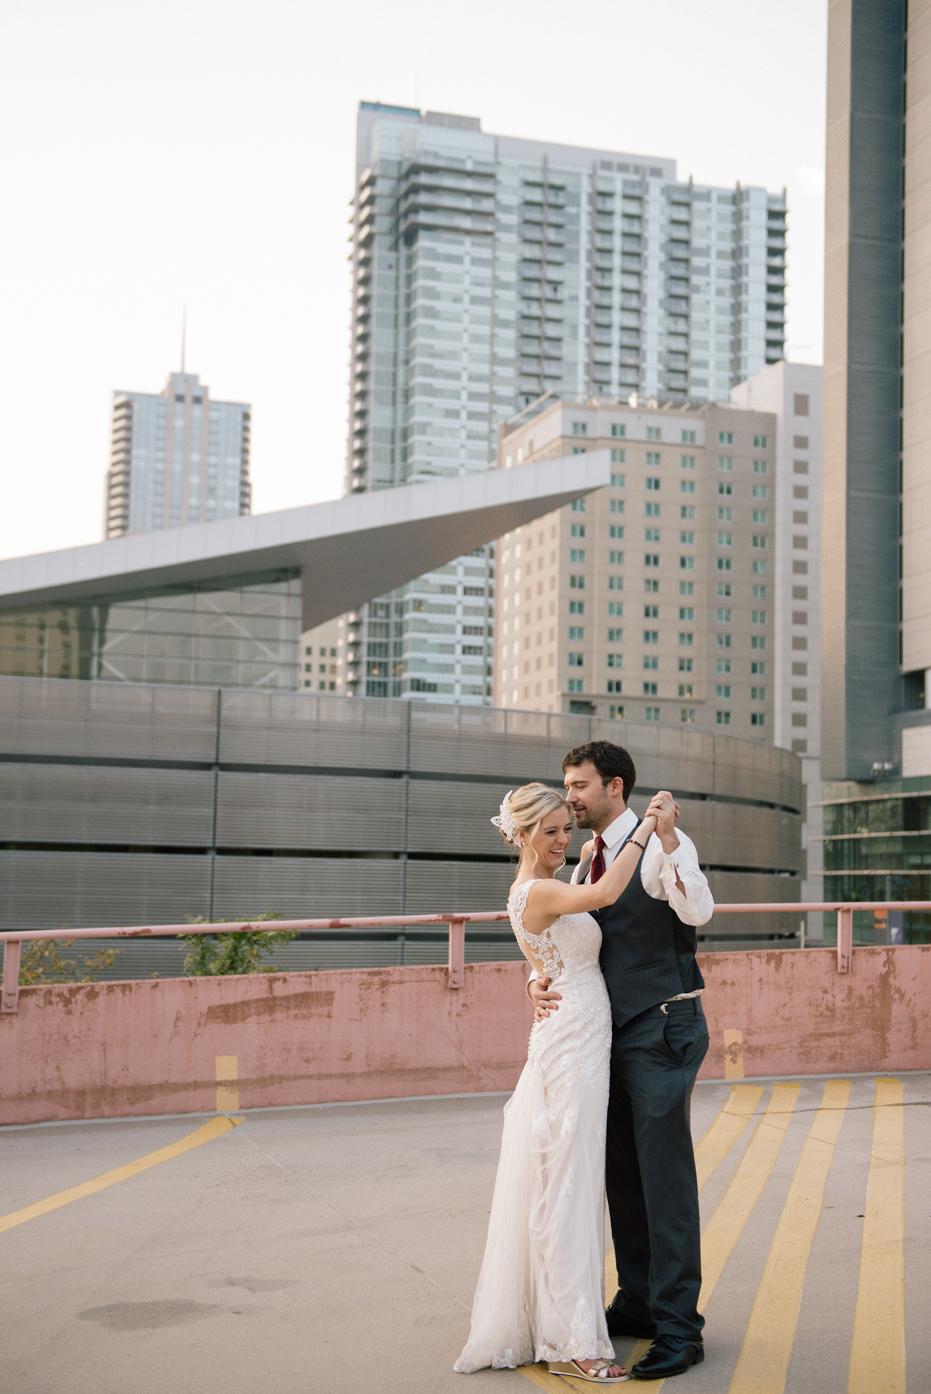 kristen_chris_wedding_023.jpg